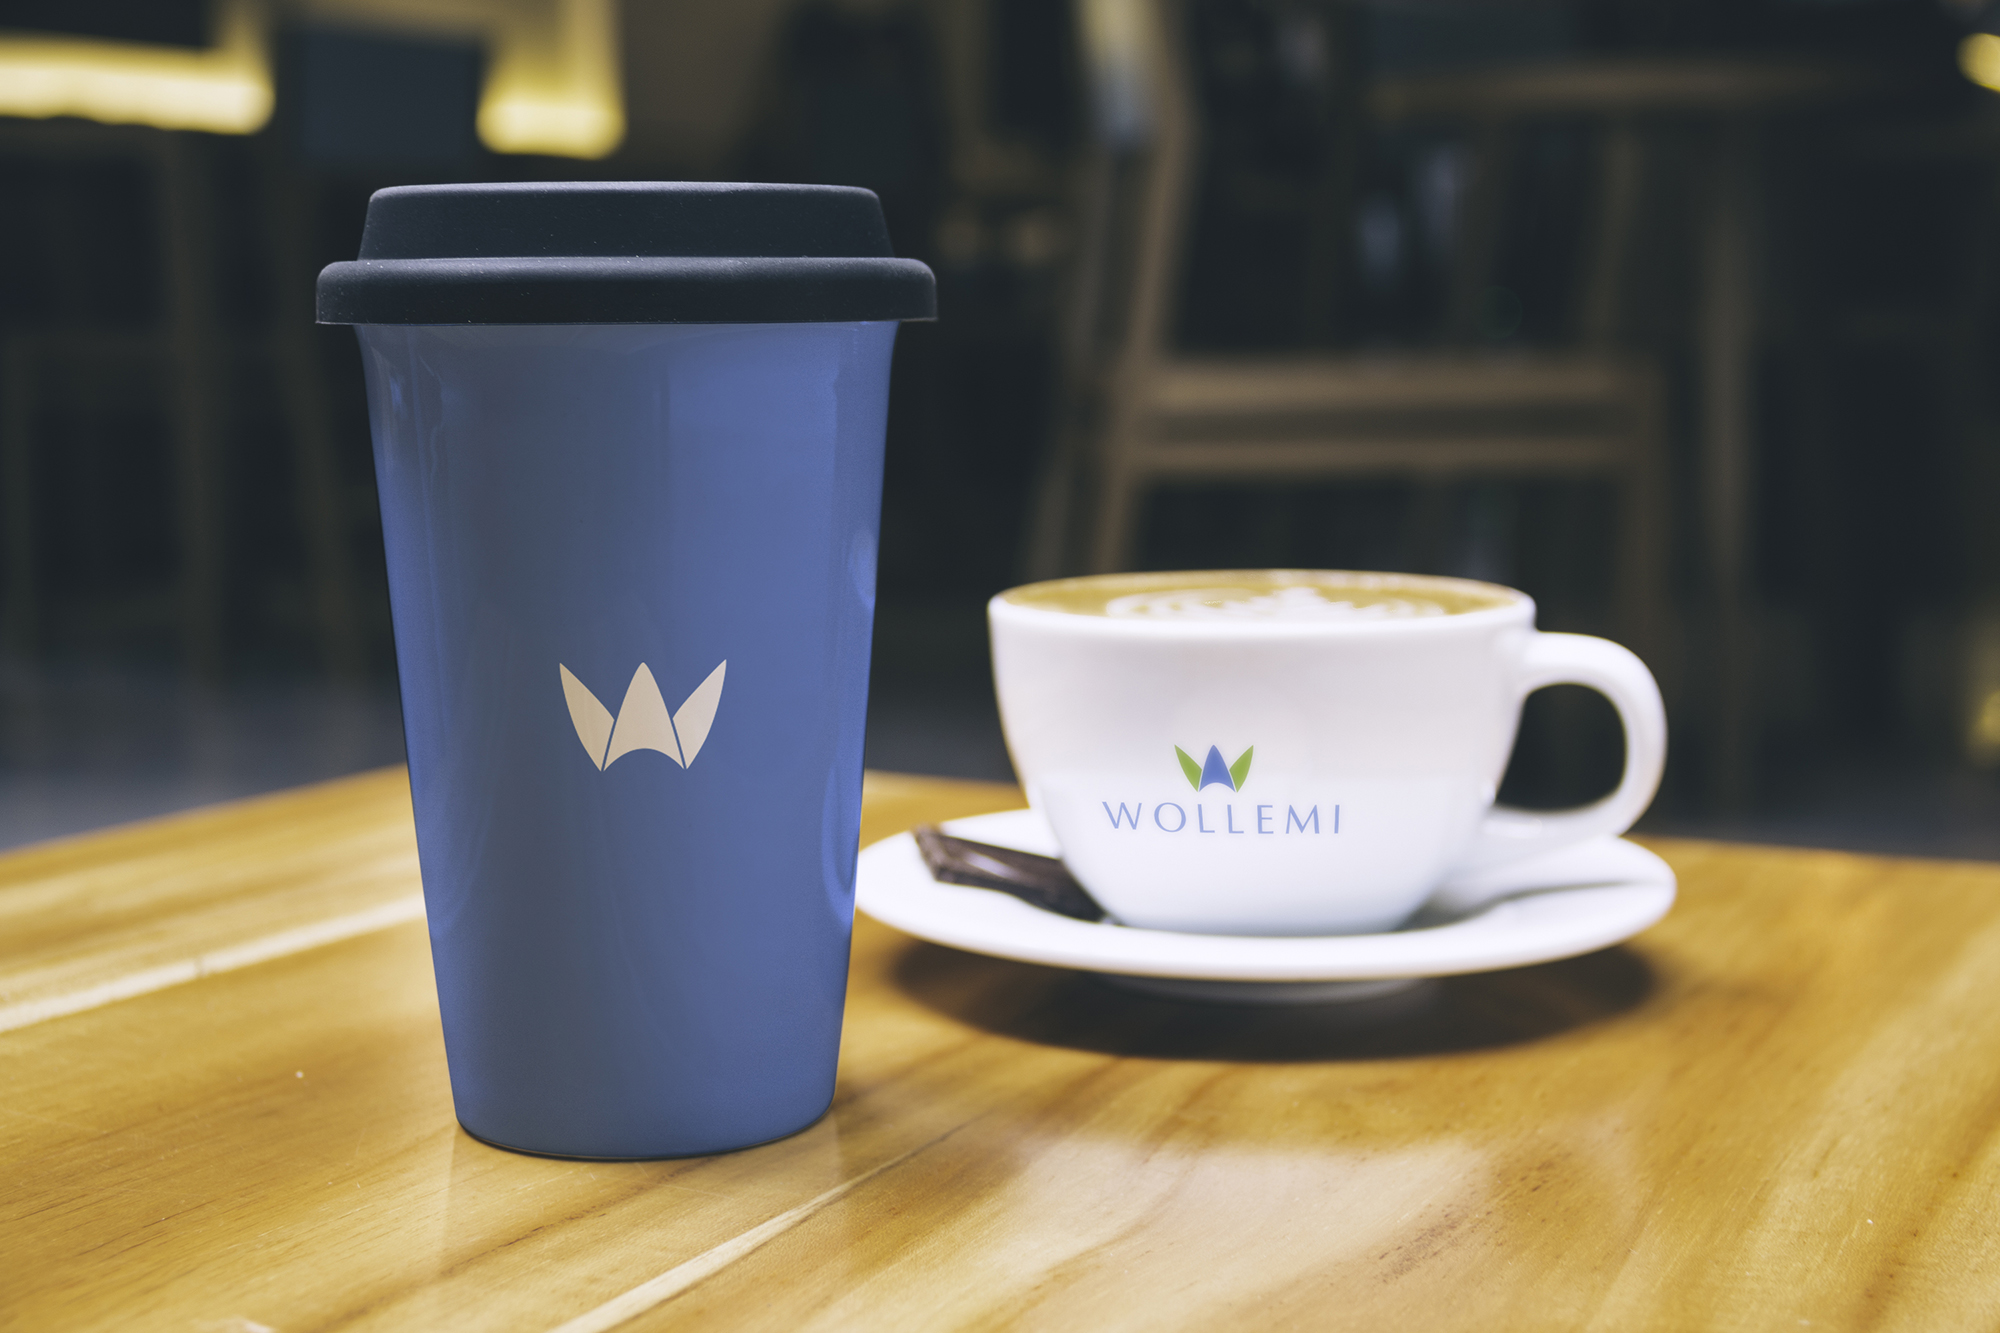 wollemi-coffeemug